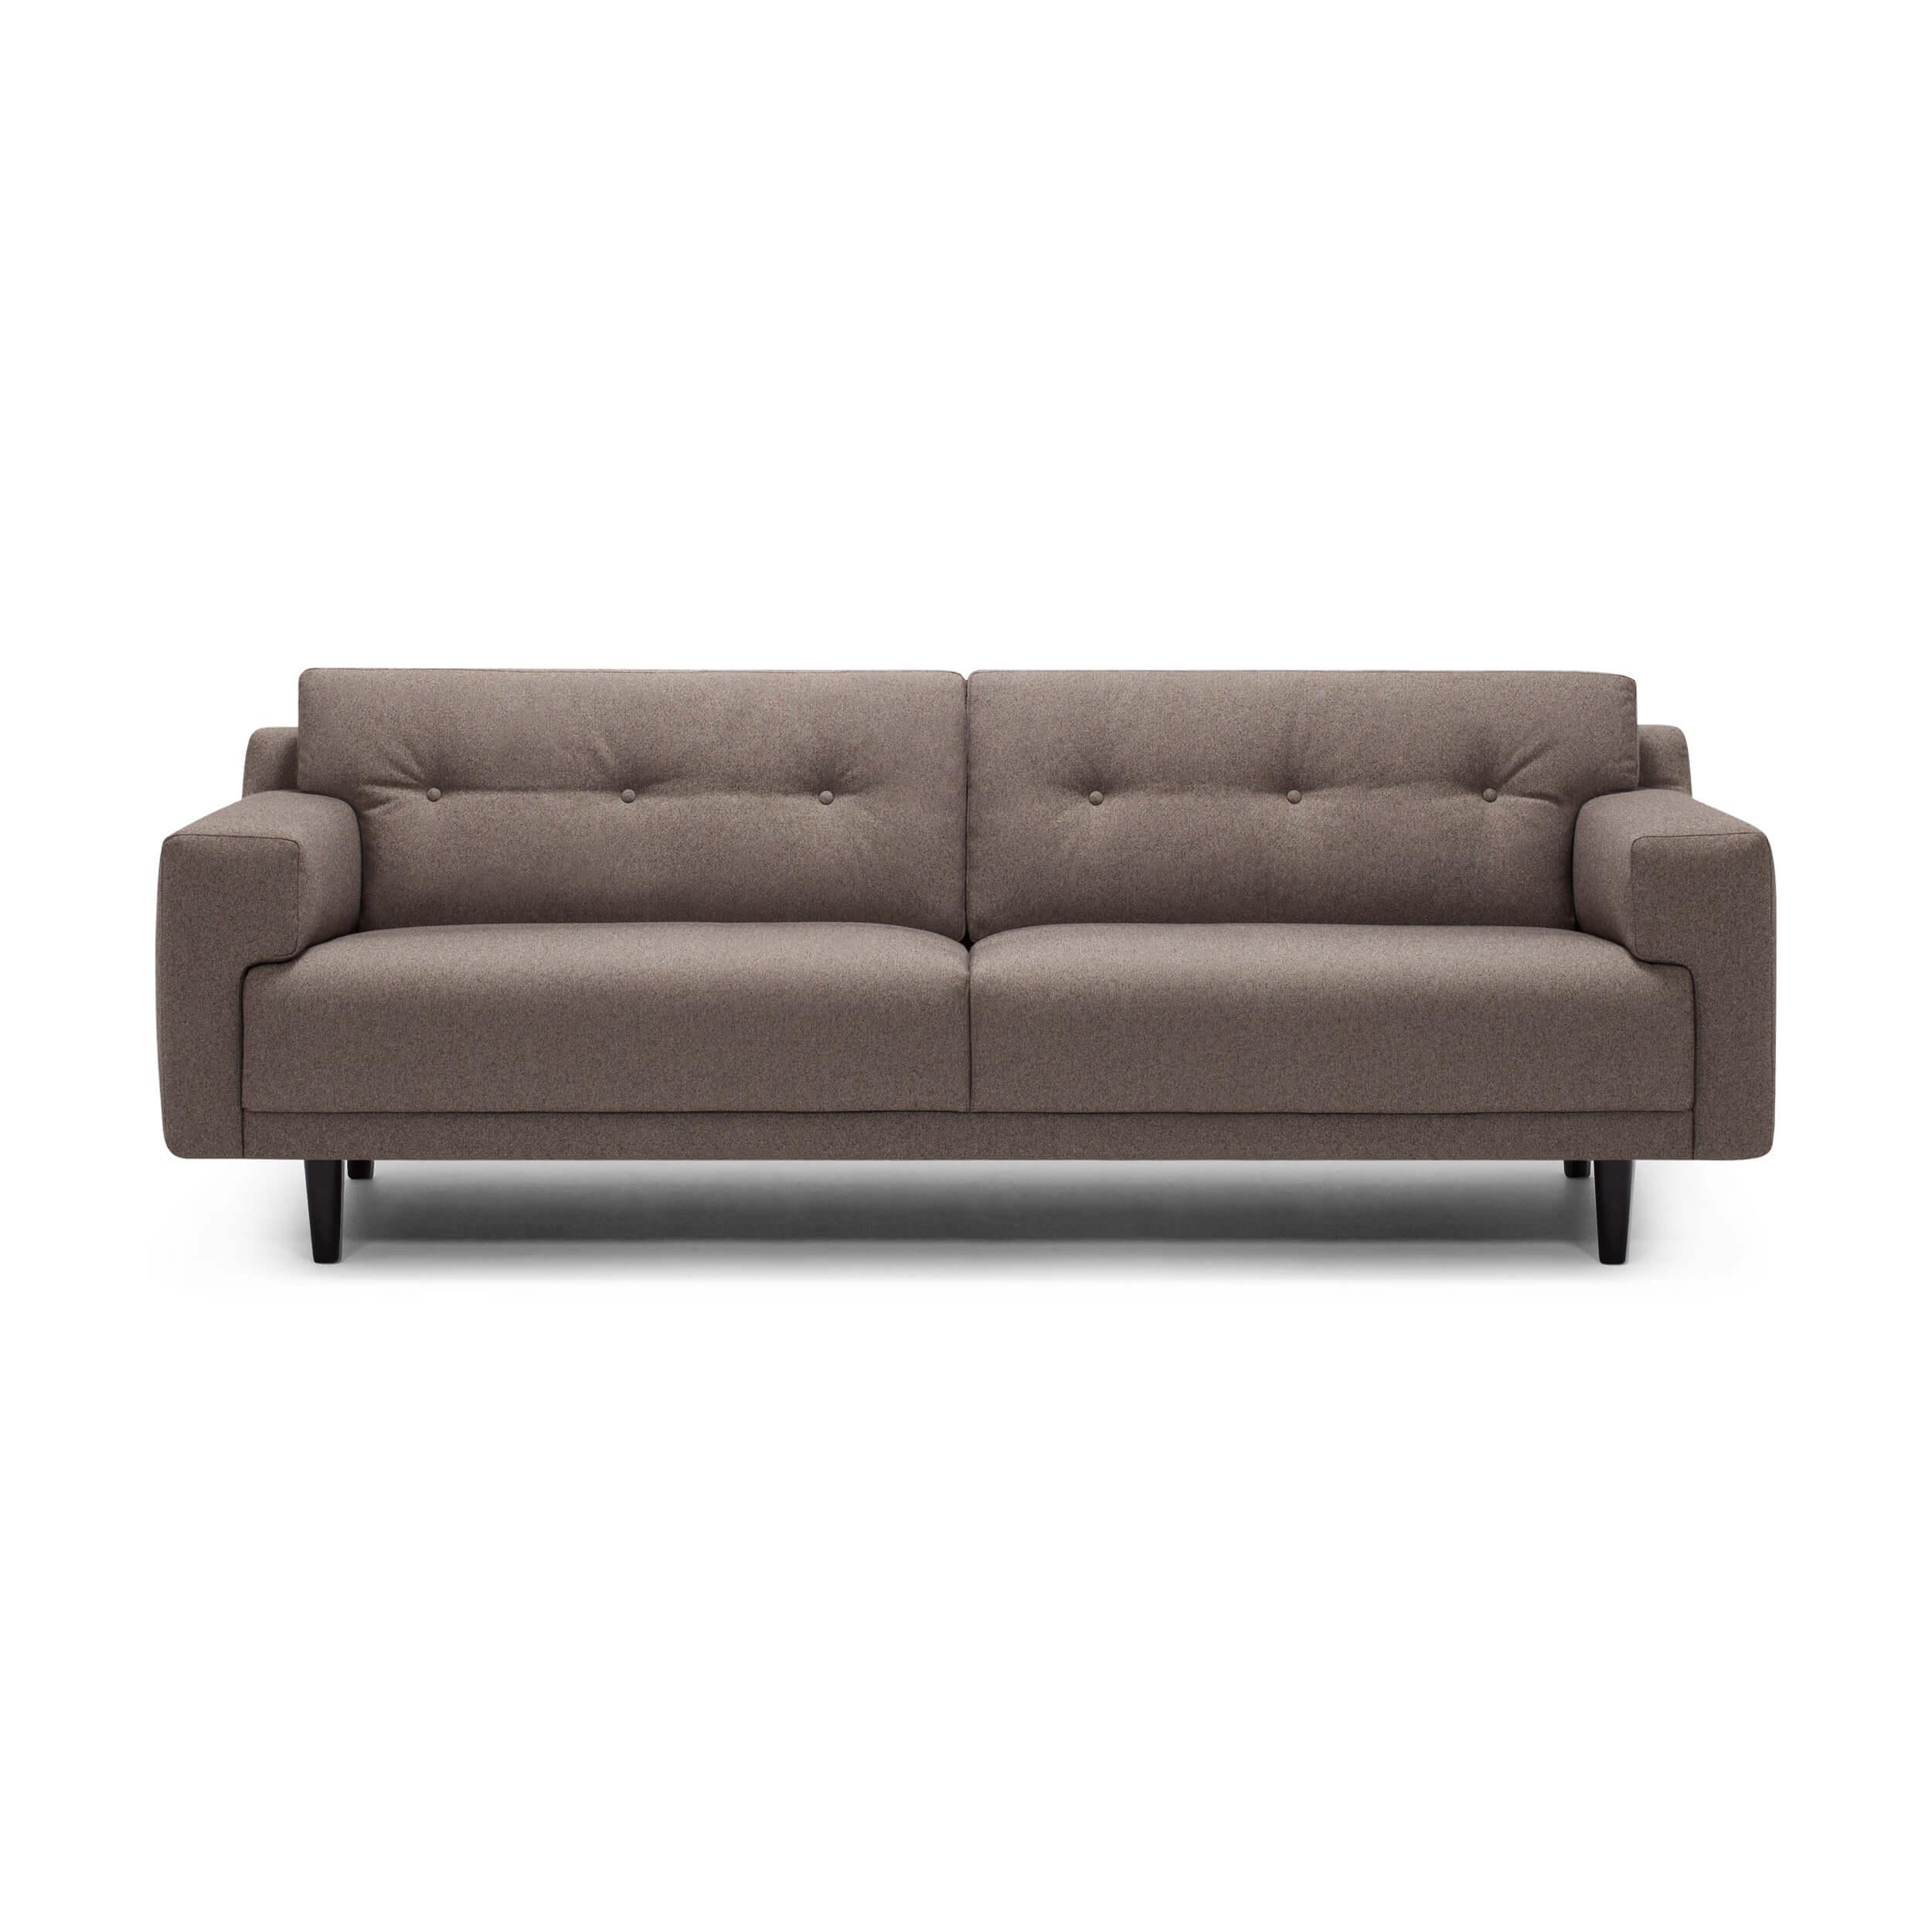 "Remi 87"" Sofa - Fabric"